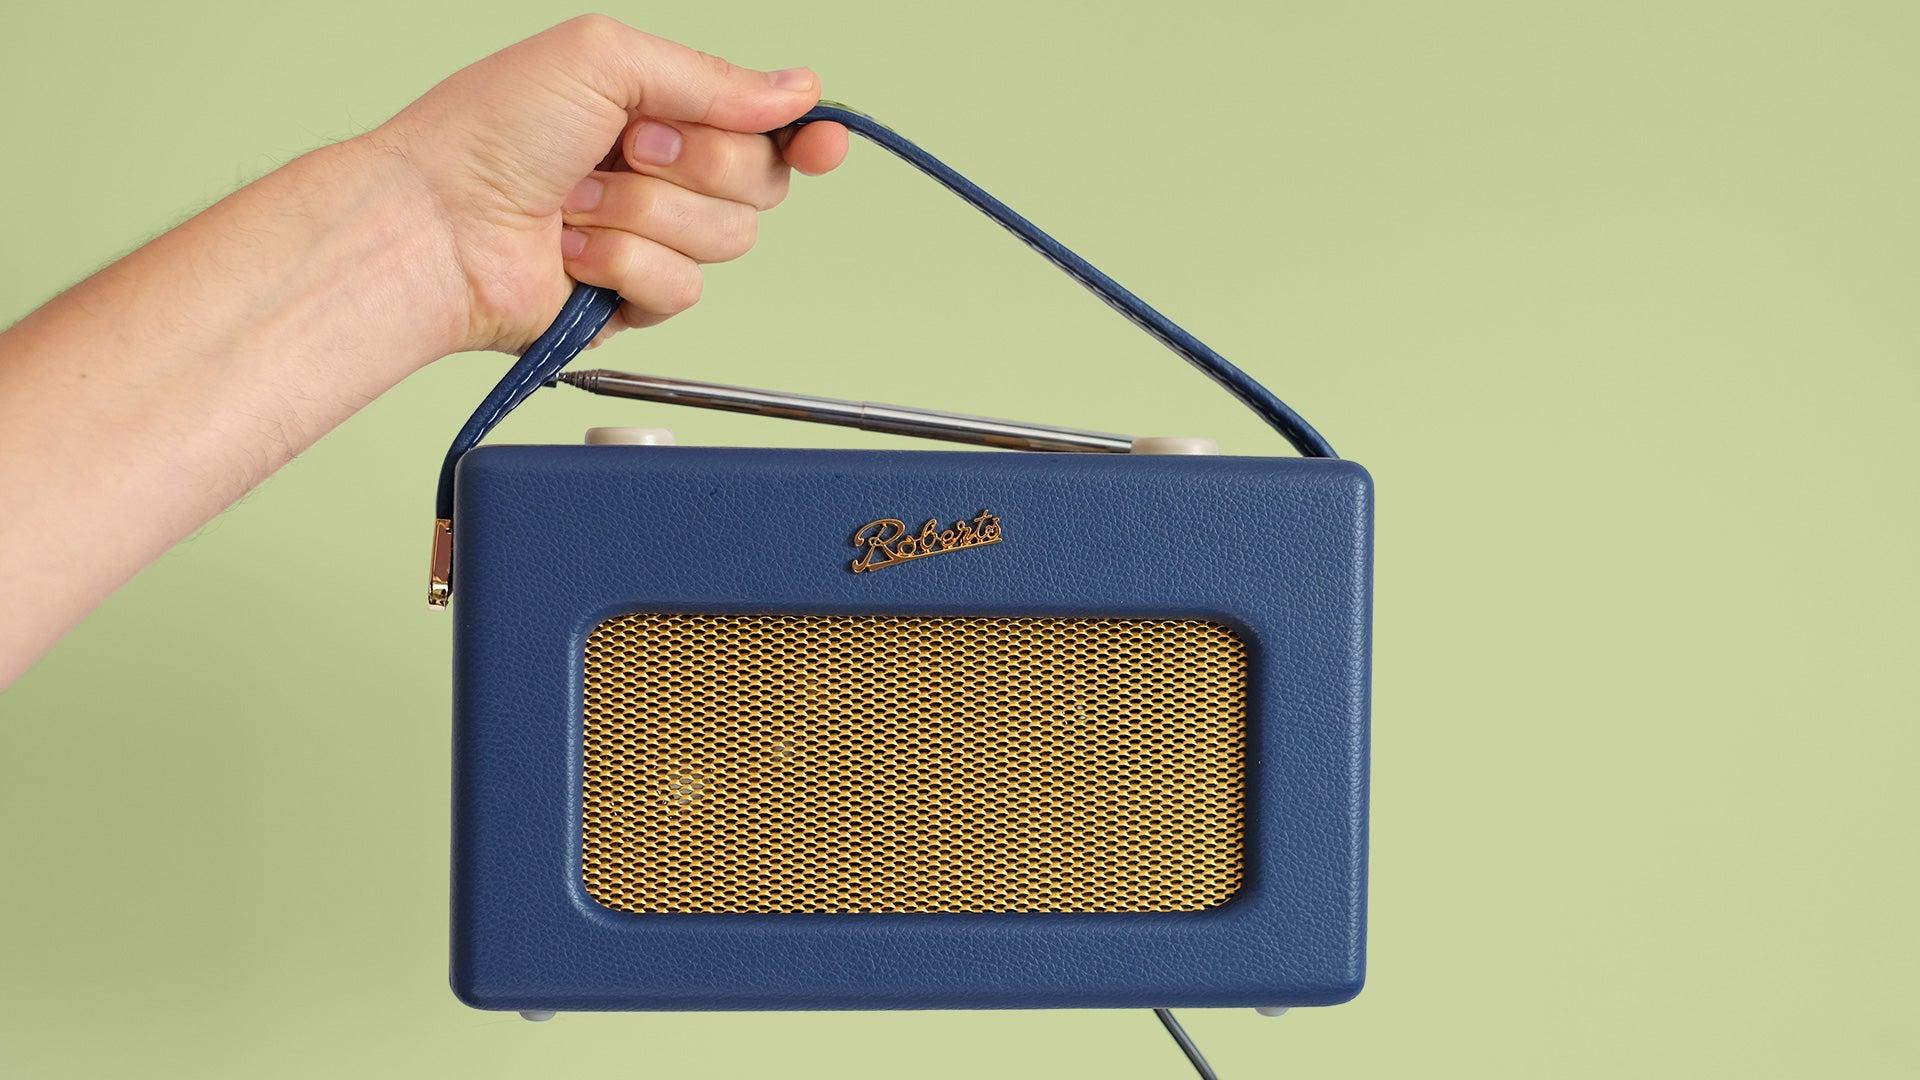 FM Wireless Portable Digital Bluetooth Radio Alexa Voice Controlled Smart Speaker Revival iStream 3 /&  Basics AA High-Capacity Rechargeable Batteries Roberts Radios REV-ISTREAM3PC Retro DAB//DAB